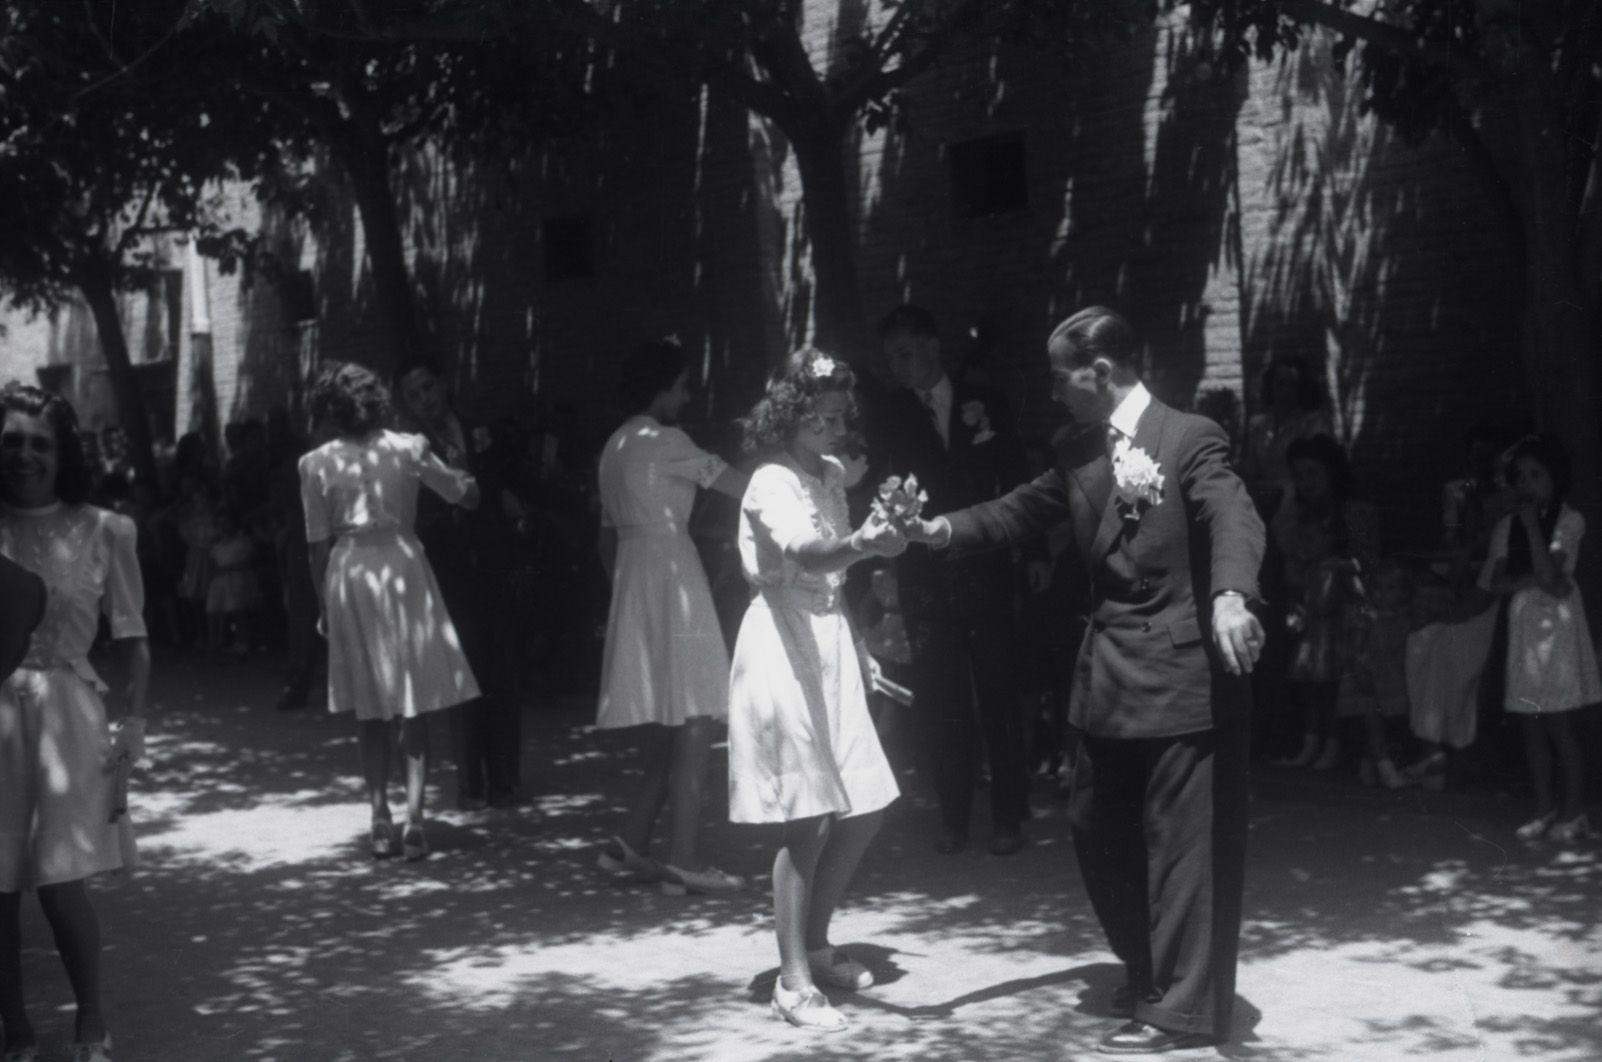 Paga-li Joan l'any 1945. Fons Cabanas (fotògrafs). AMSCV